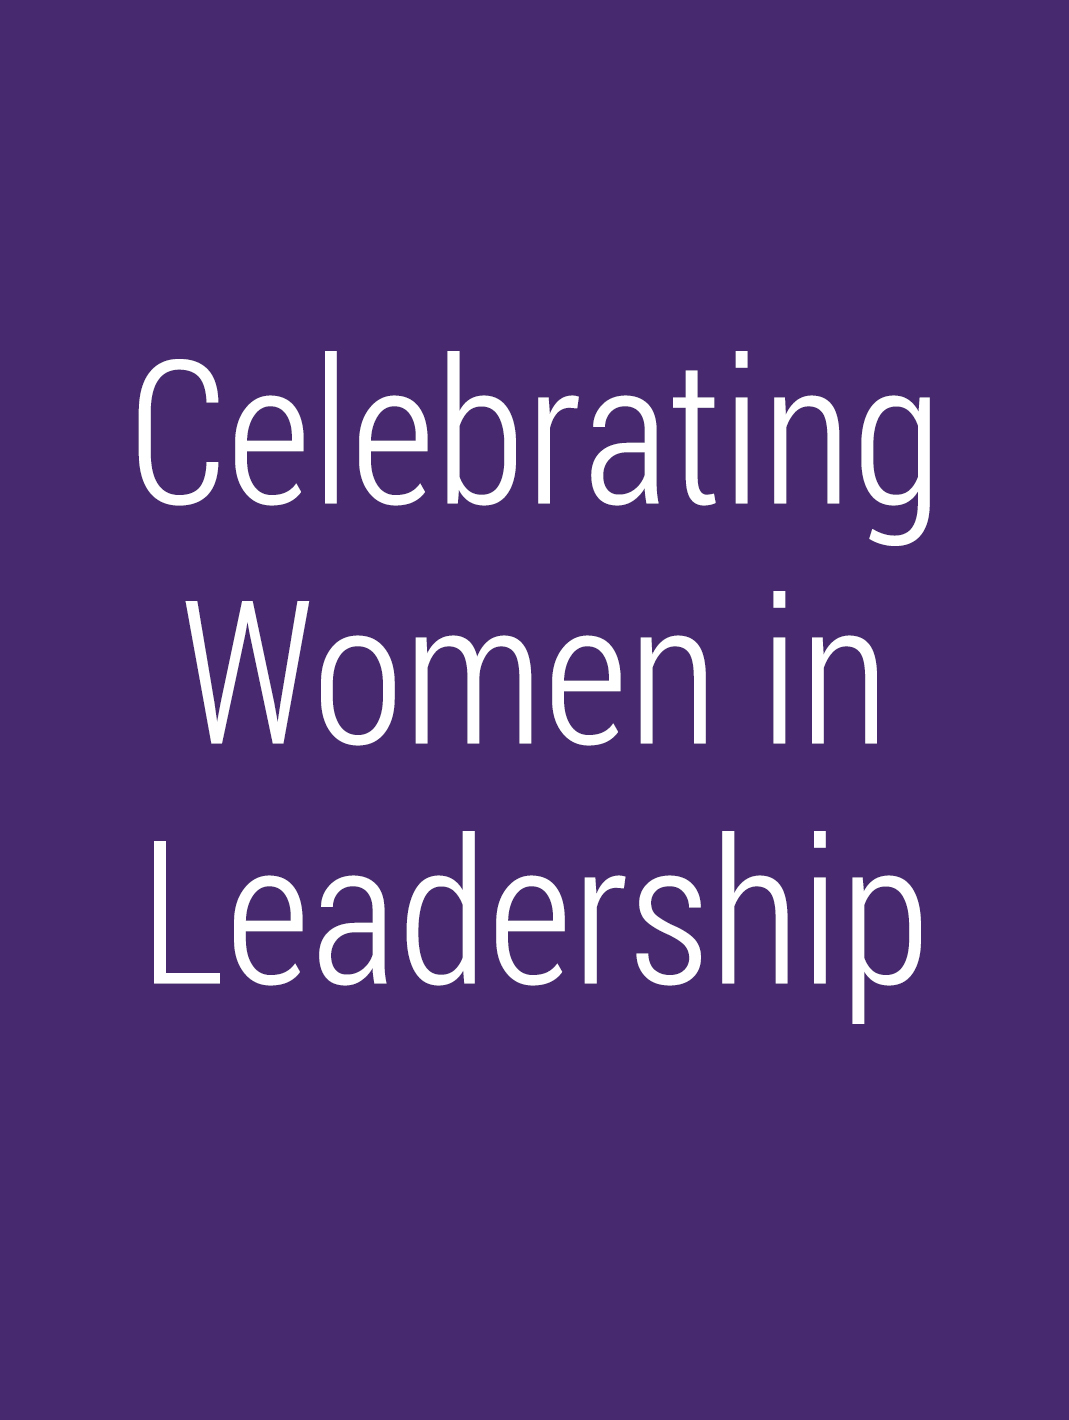 IWD Celebrating Women in Leadership Thumbnail